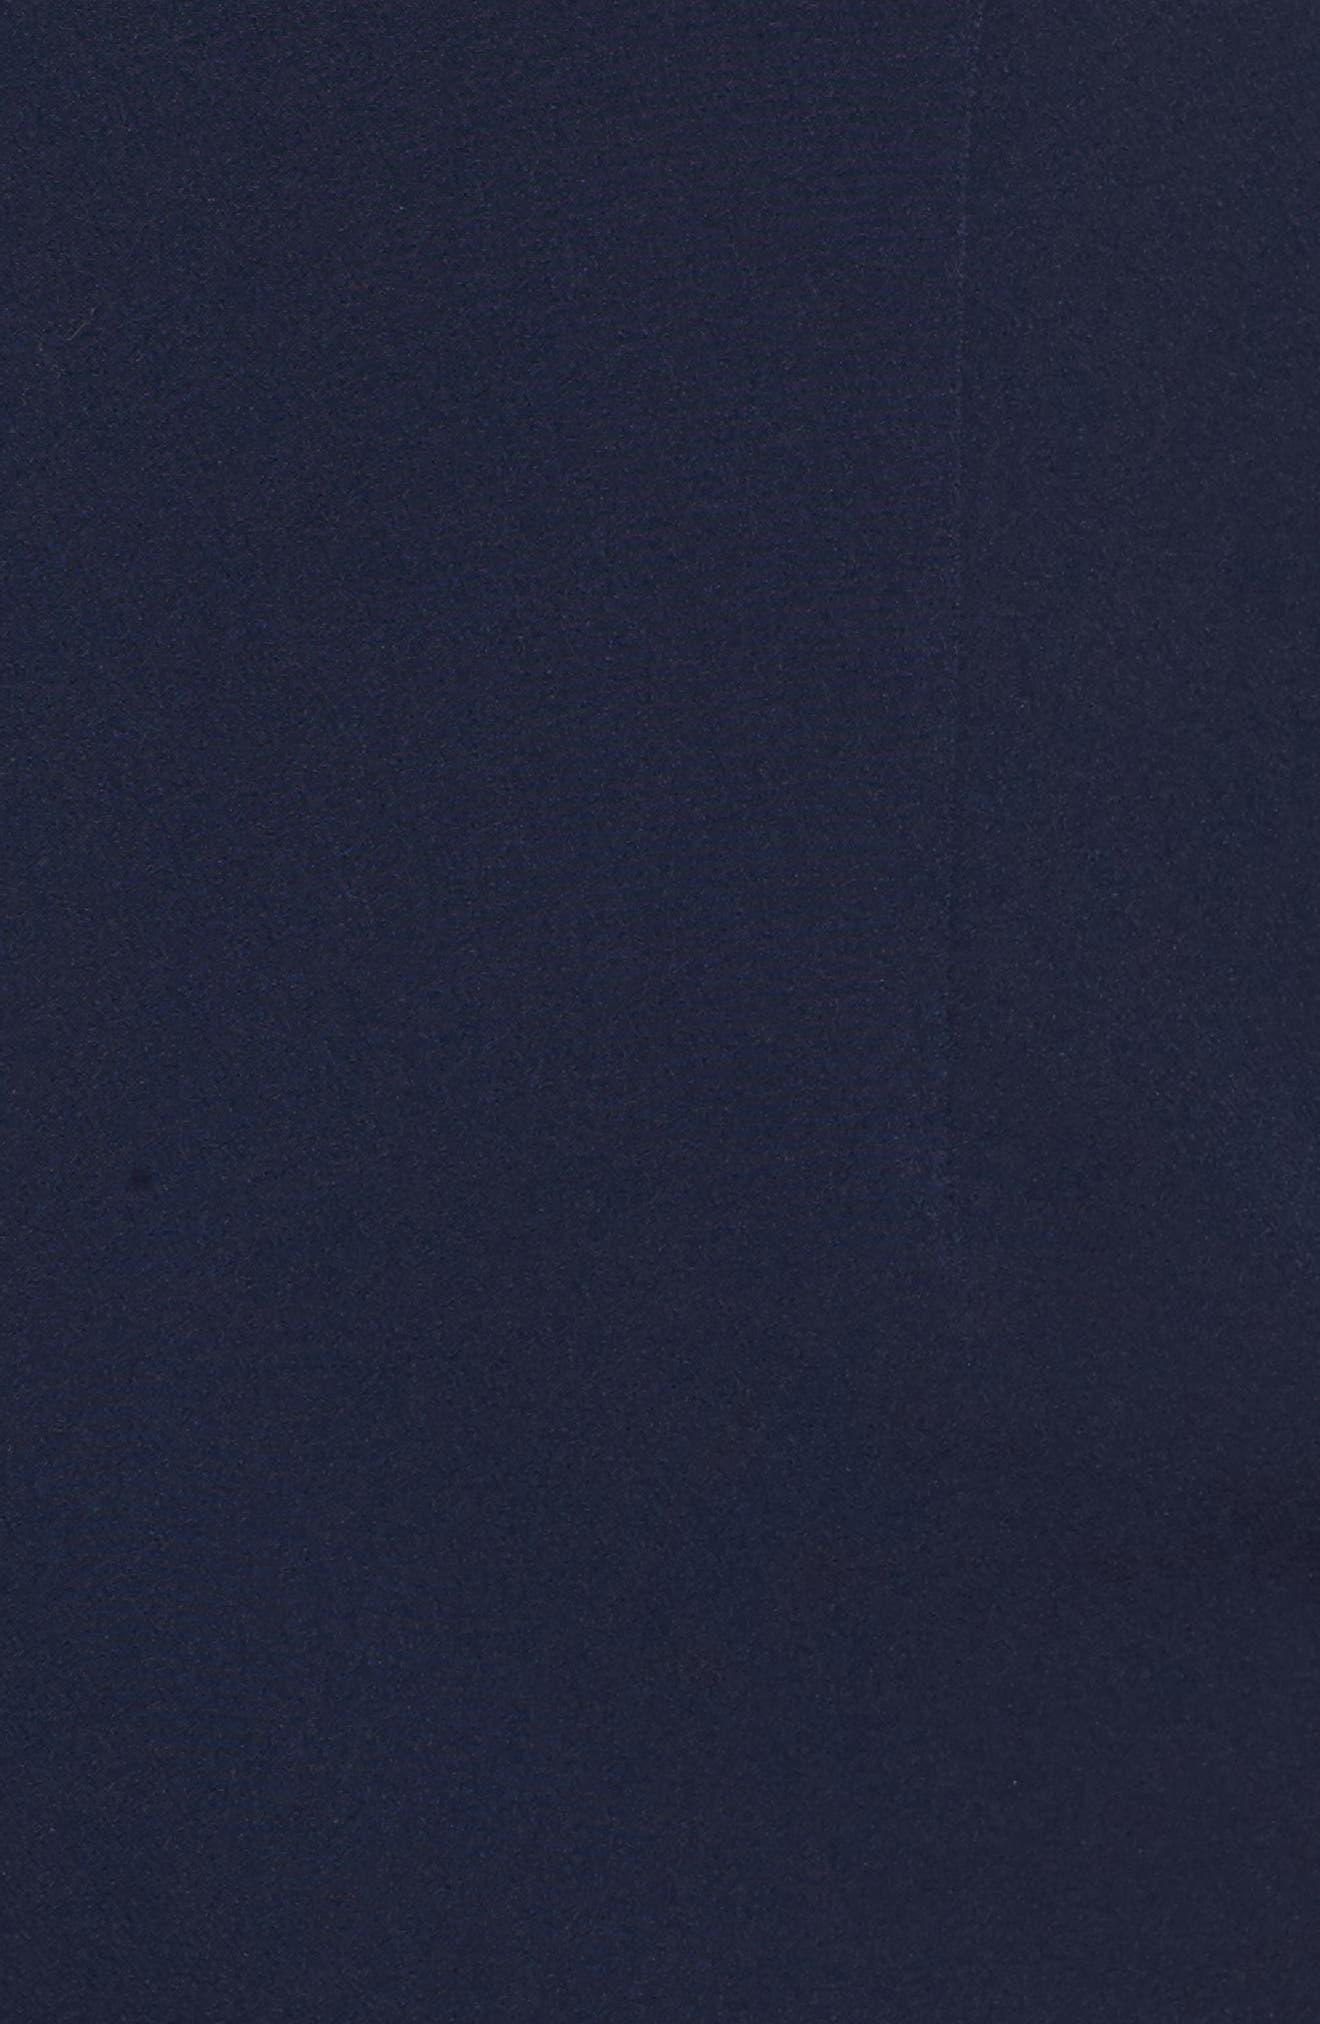 Cold Shoulder Sheath Dress,                             Alternate thumbnail 5, color,                             401